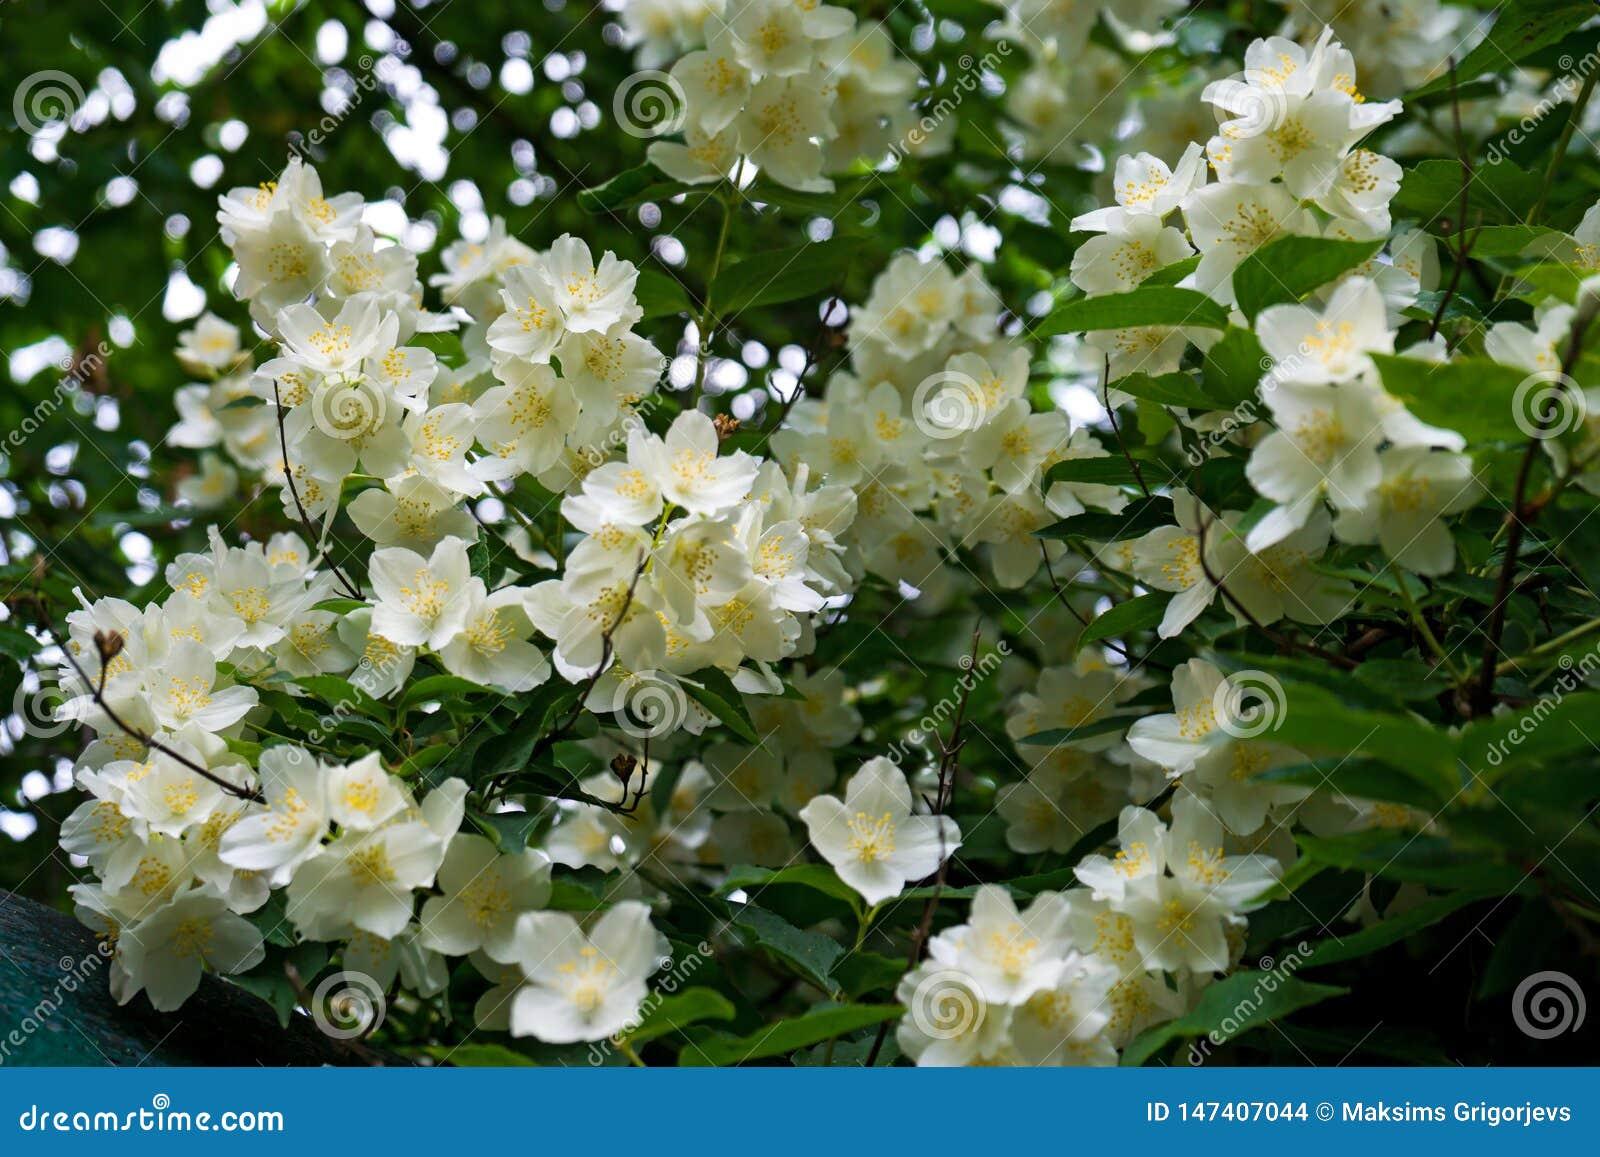 Sluit omhoog bloeiende jasmijnbloem op struik in tuin, geselecteerde nadruk